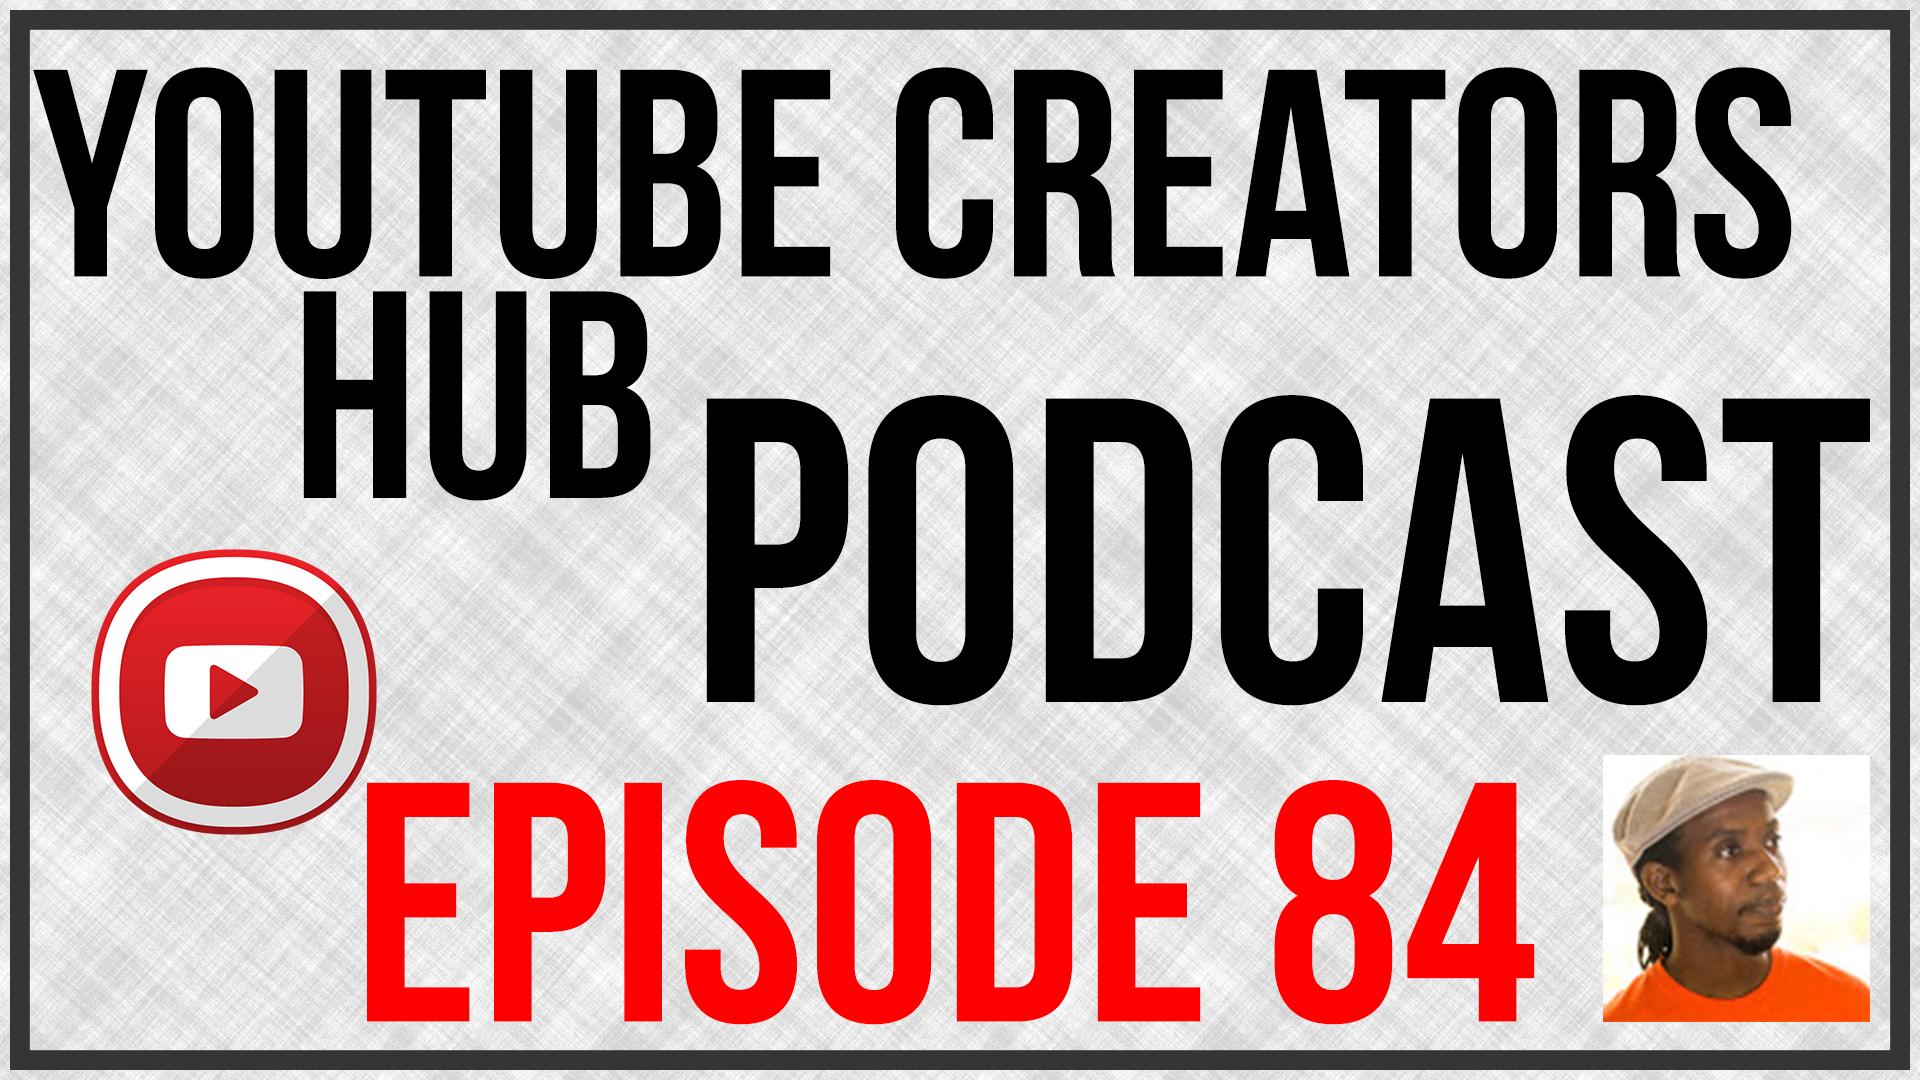 YouTube Creators Hub Podcast Episode 84